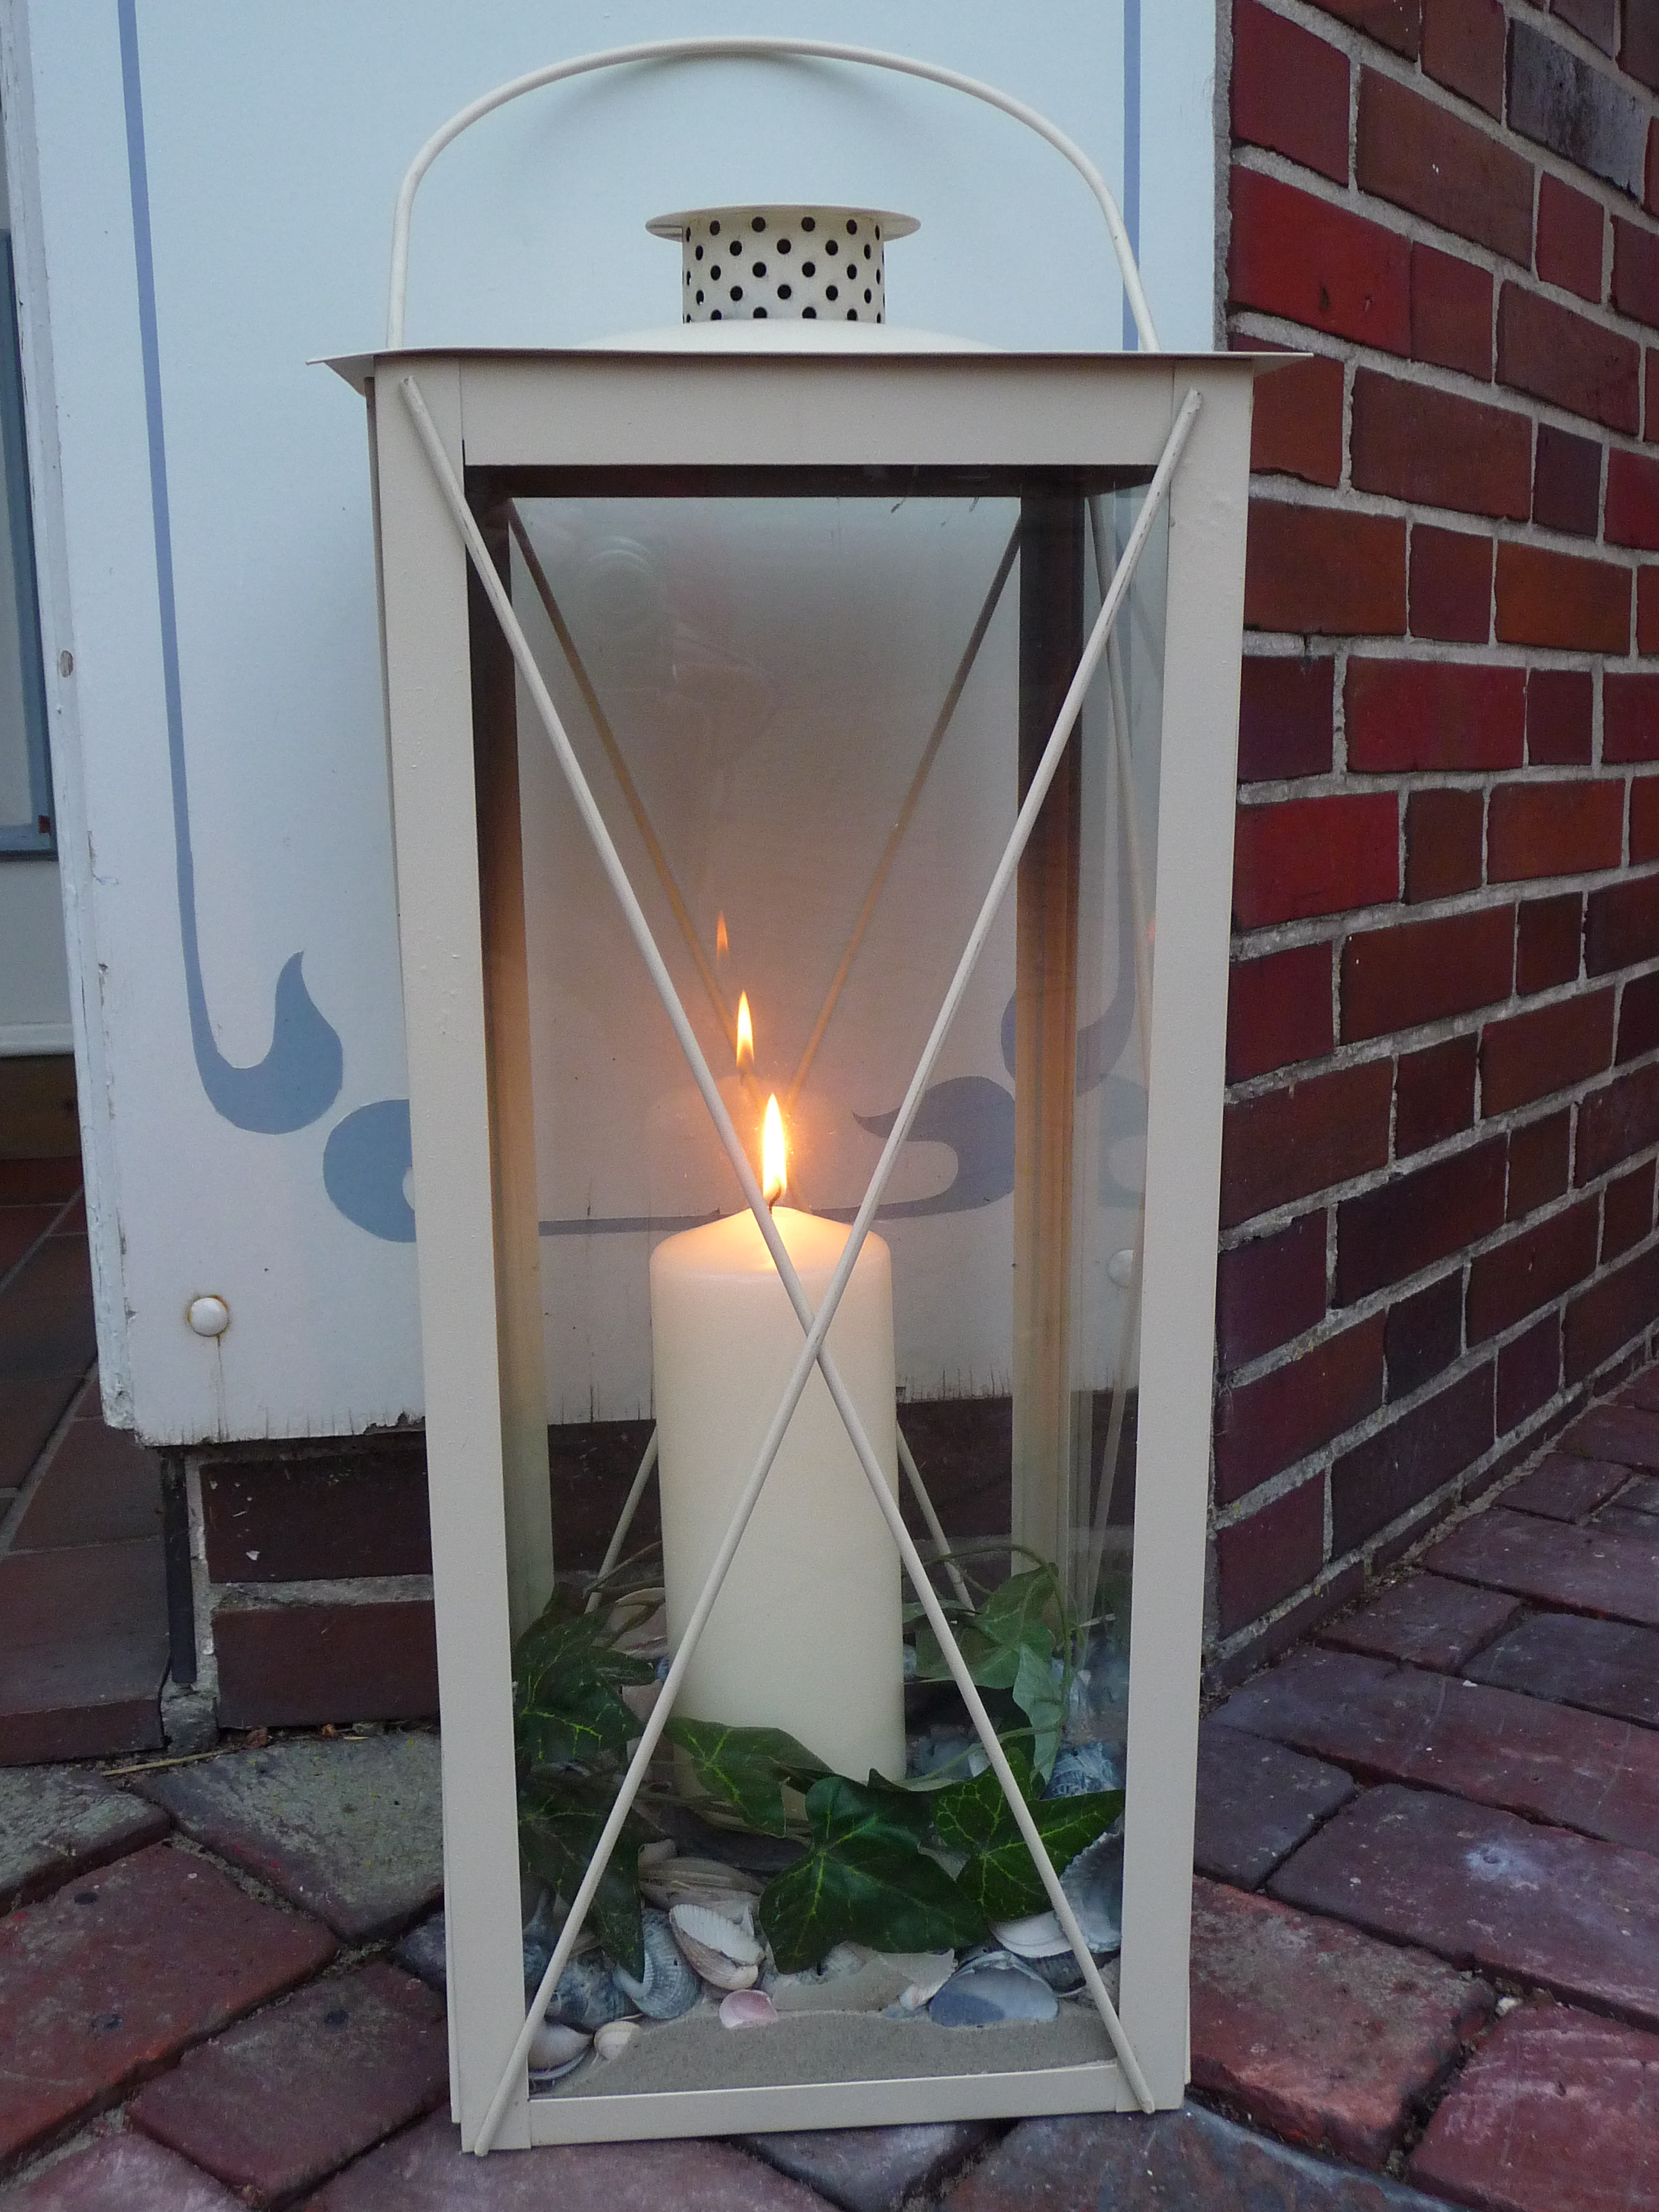 blomus 65274 windlicht mit kerze piedra h he 23 5 cm smash. Black Bedroom Furniture Sets. Home Design Ideas